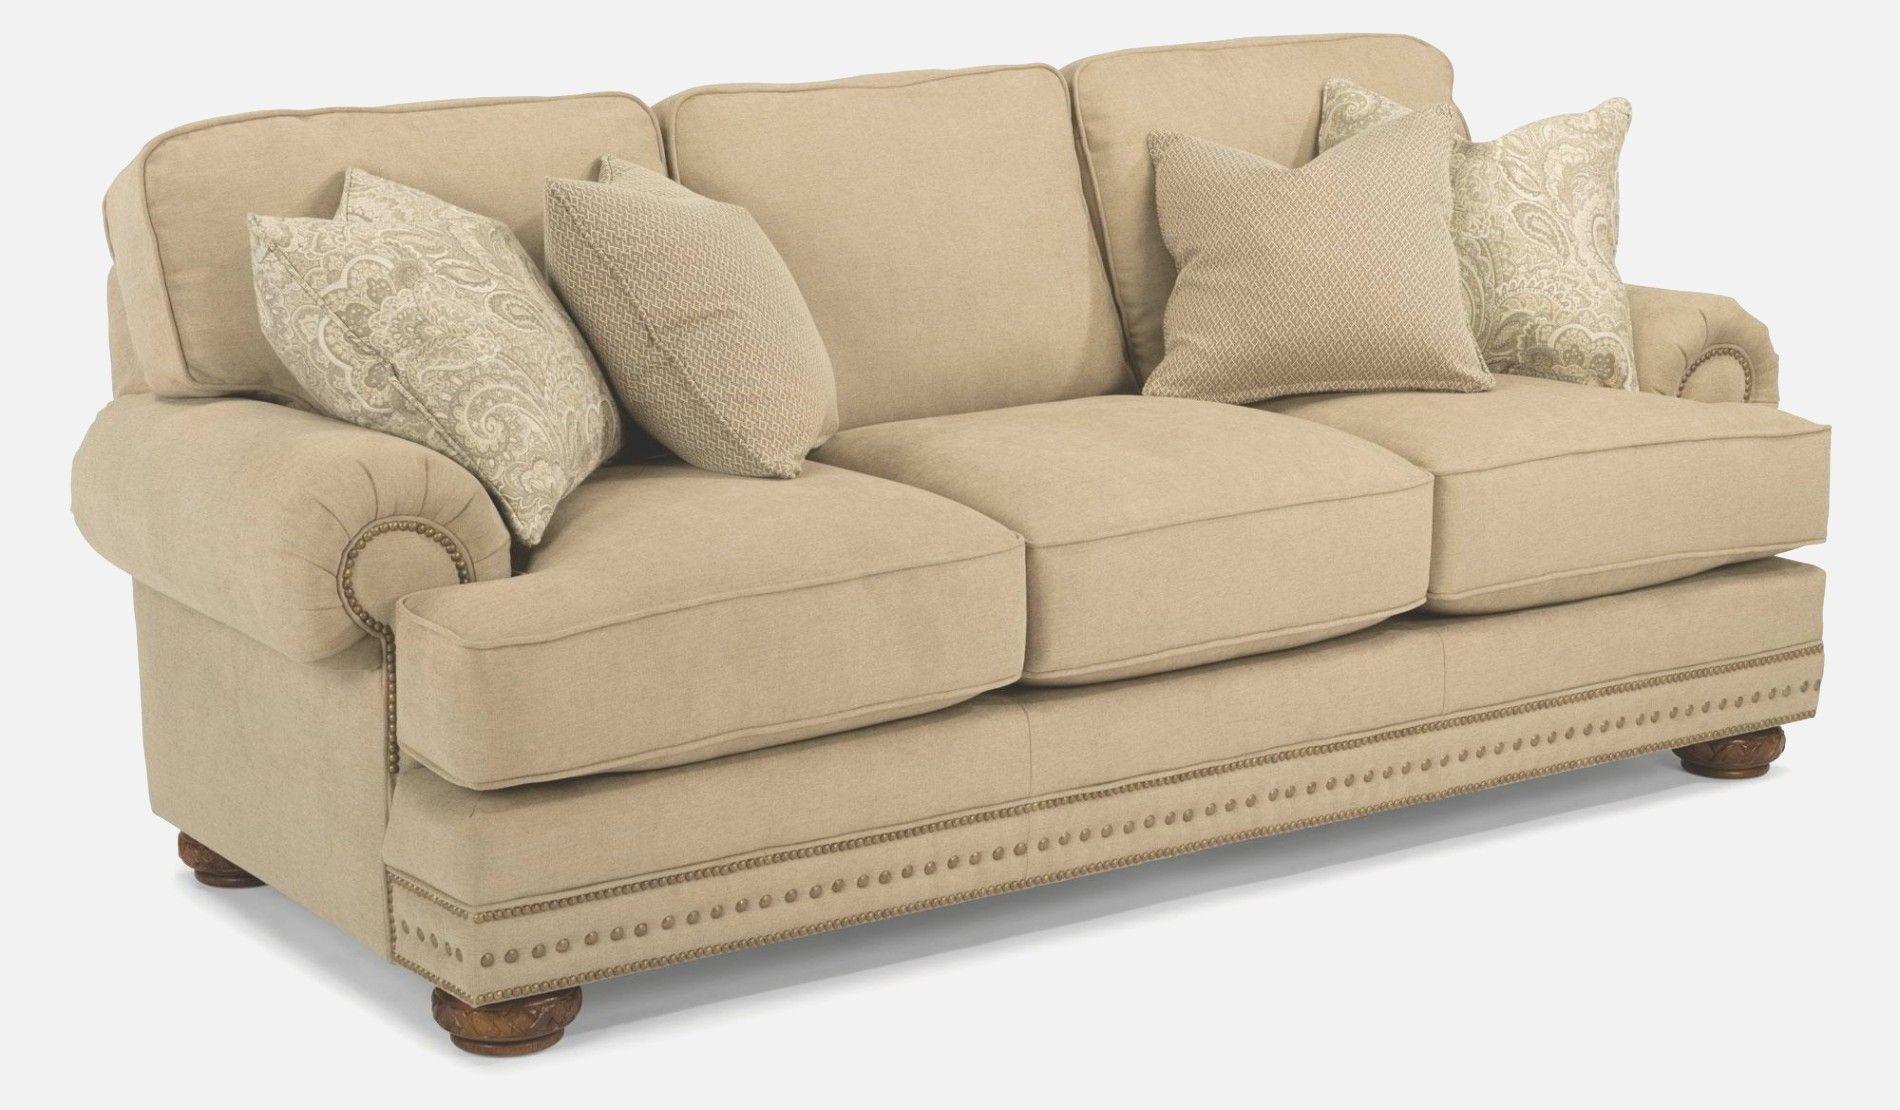 Sofa Mart Charlotte Nc Hours Ikea Blvd Reviews